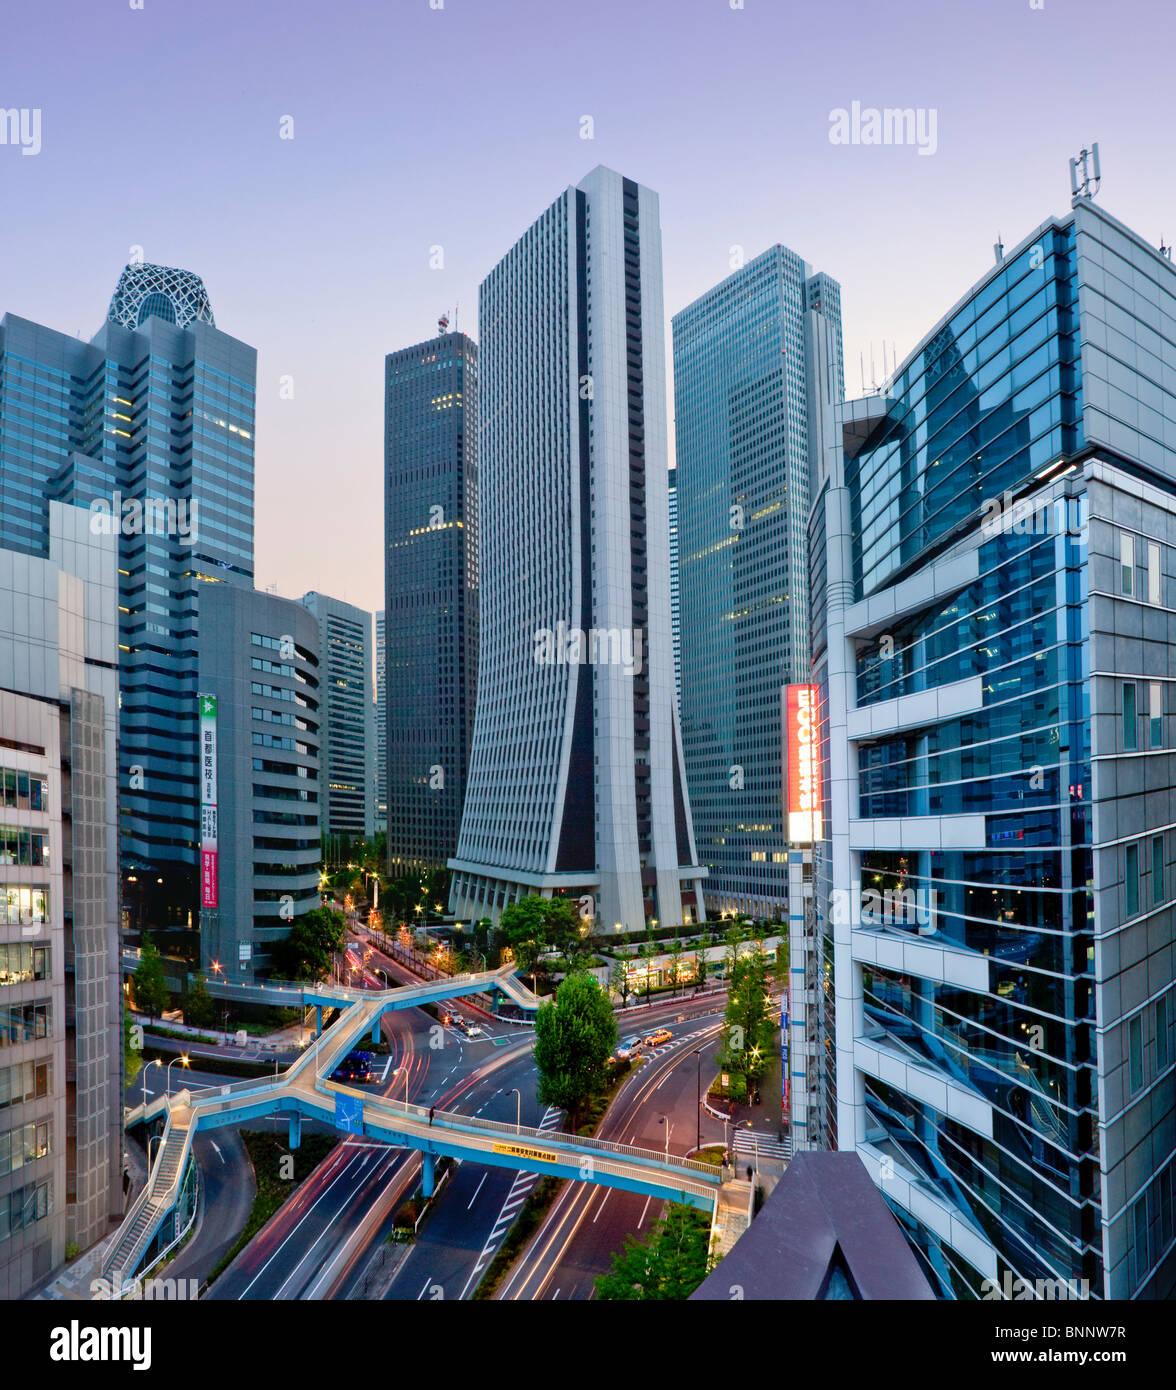 japan asia far east tokyo town city traffic shinjuku building stock